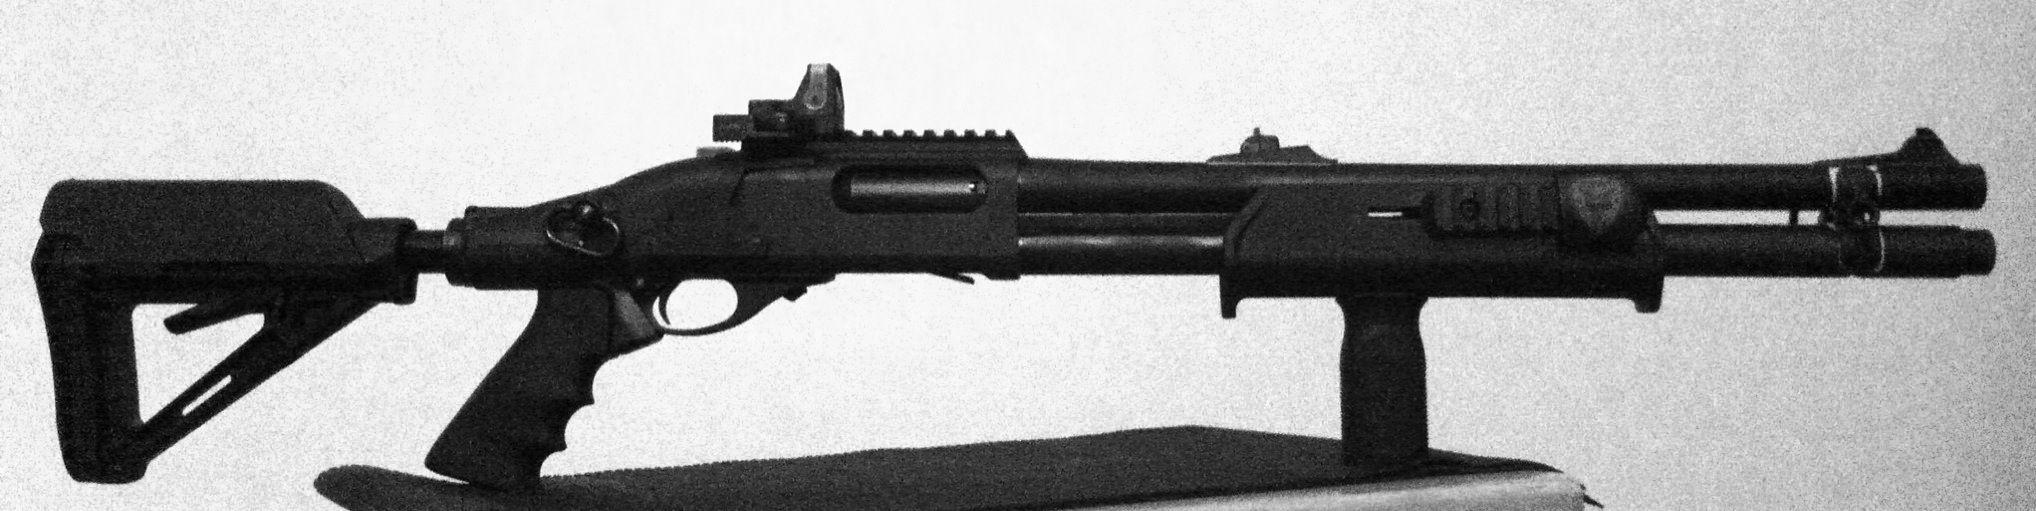 Remington 870 Tactical Magpul Furniture